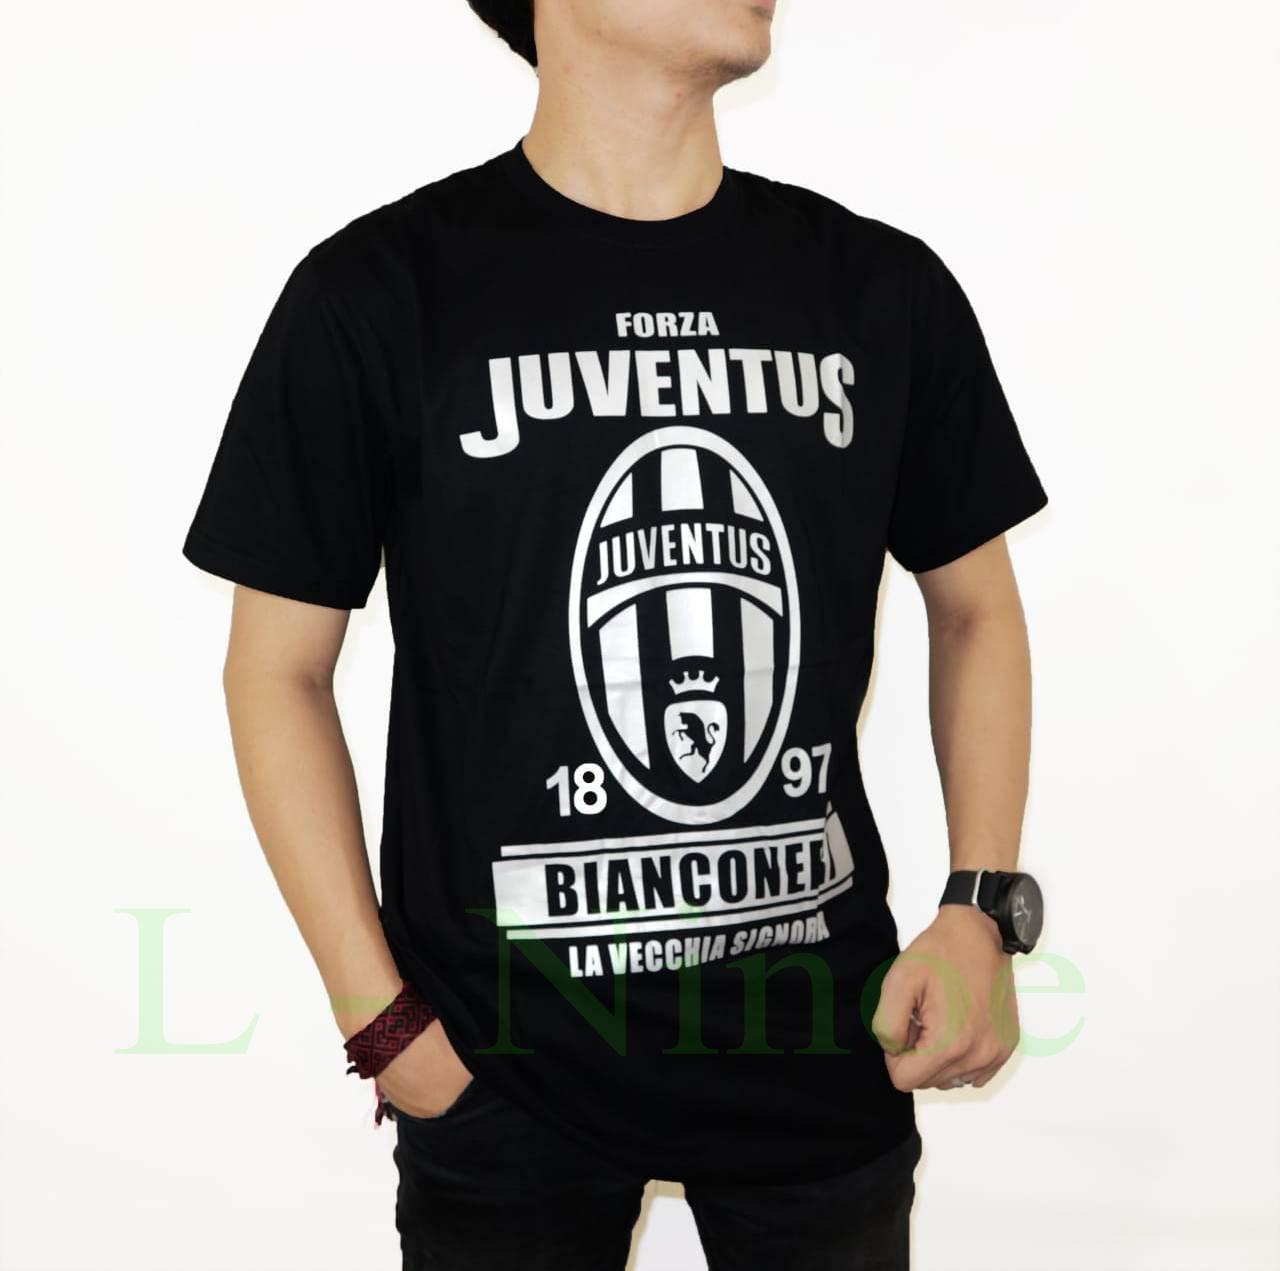 Buy Sell Cheapest Kaos Tshirt Juventus Best Quality Product Deals Baju Bola Juve New Logo 2017 L Ninoe Distro T Shirt Fashion 100 Soft Cotton Combed 30s Pria Gambar Baru Kartun Marvel Sablon